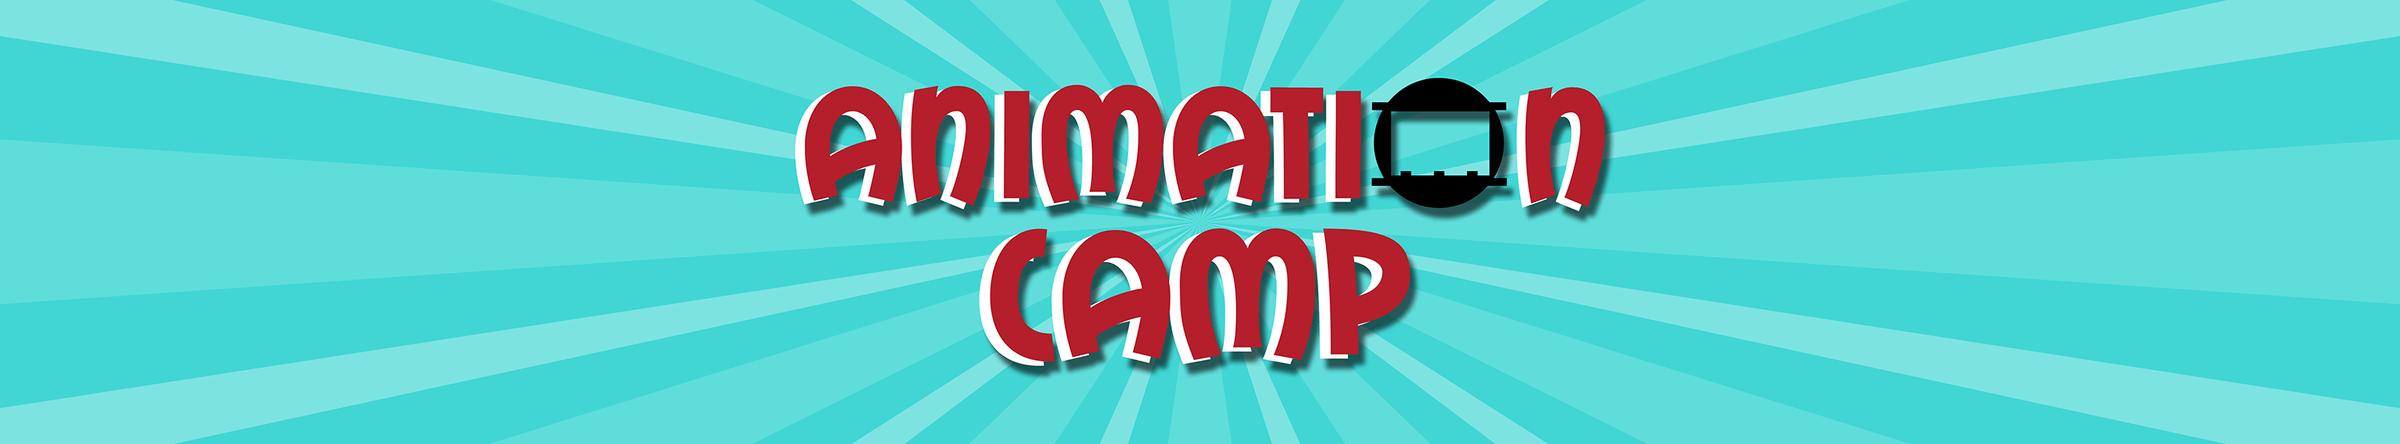 AnimationCamp - Header - 3